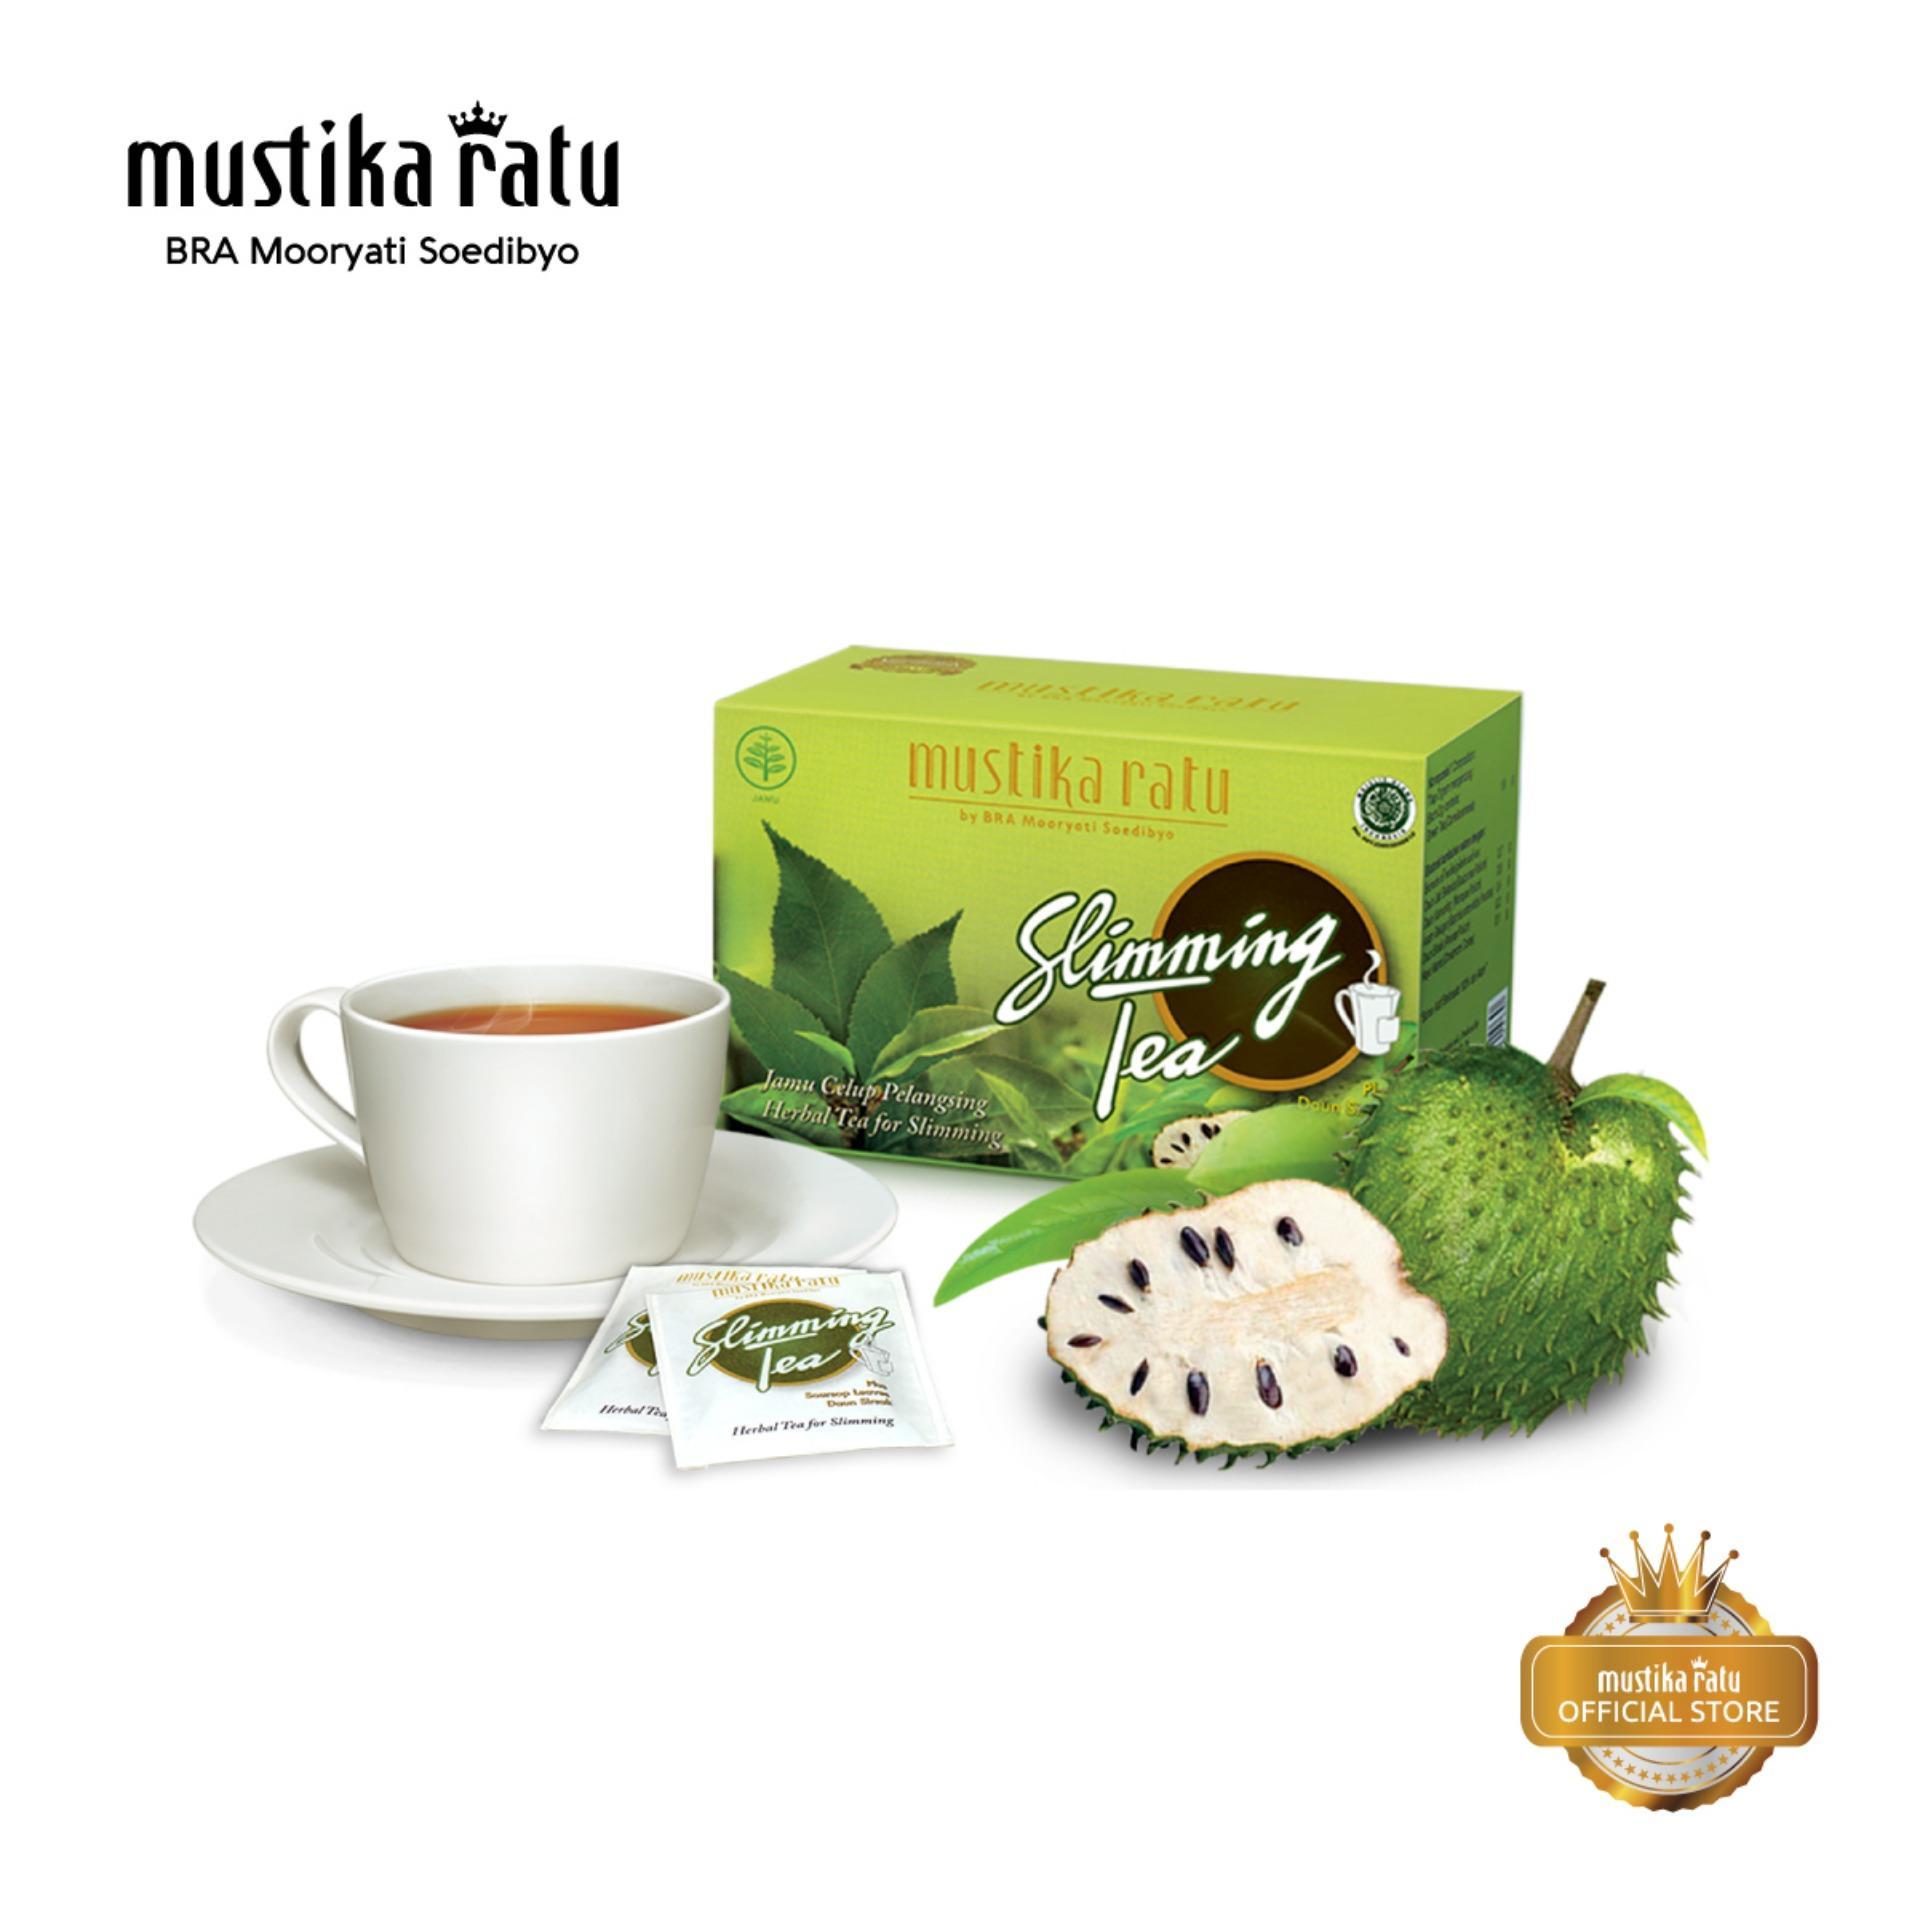 Mustika Ratu Slimming Tea Teh Herbal Pelangsing Badan Bakar Lemak Rasa Buah Sirsak 15 Bags By Mustika Ratu